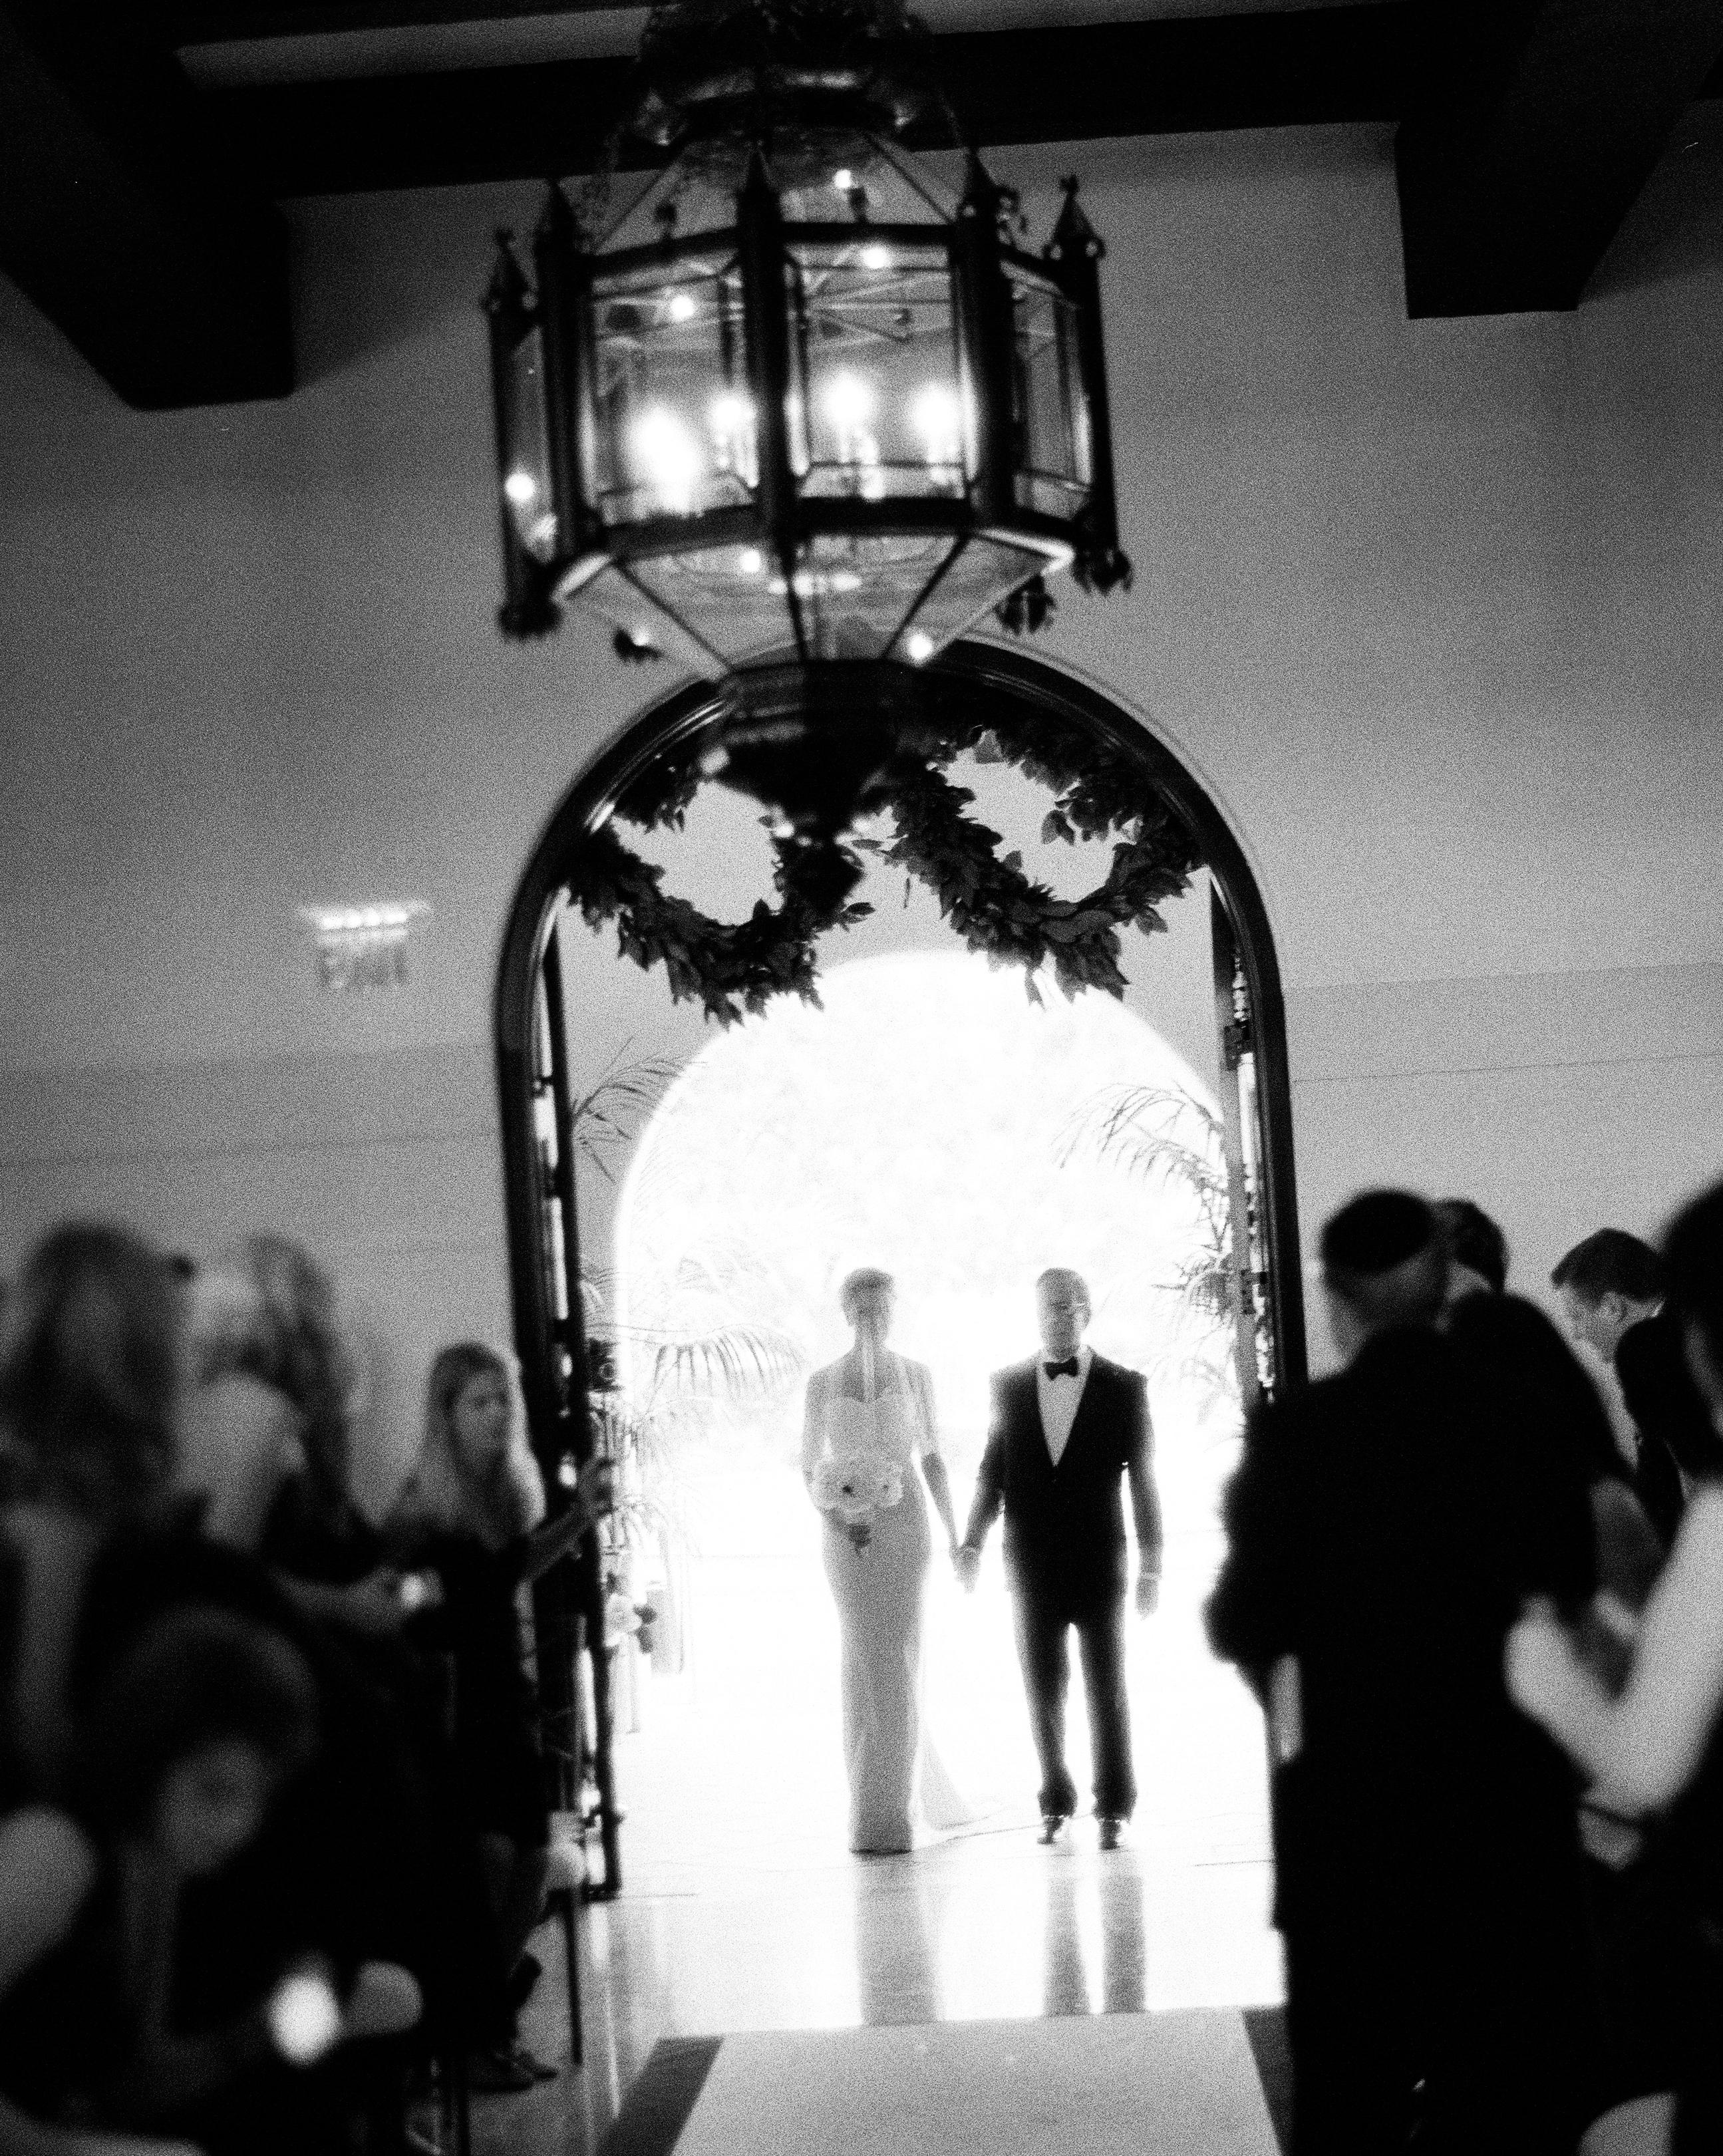 real-wedding-fall14-jojo-eric-060elizabeth-messina-ds111226-0814.jpg